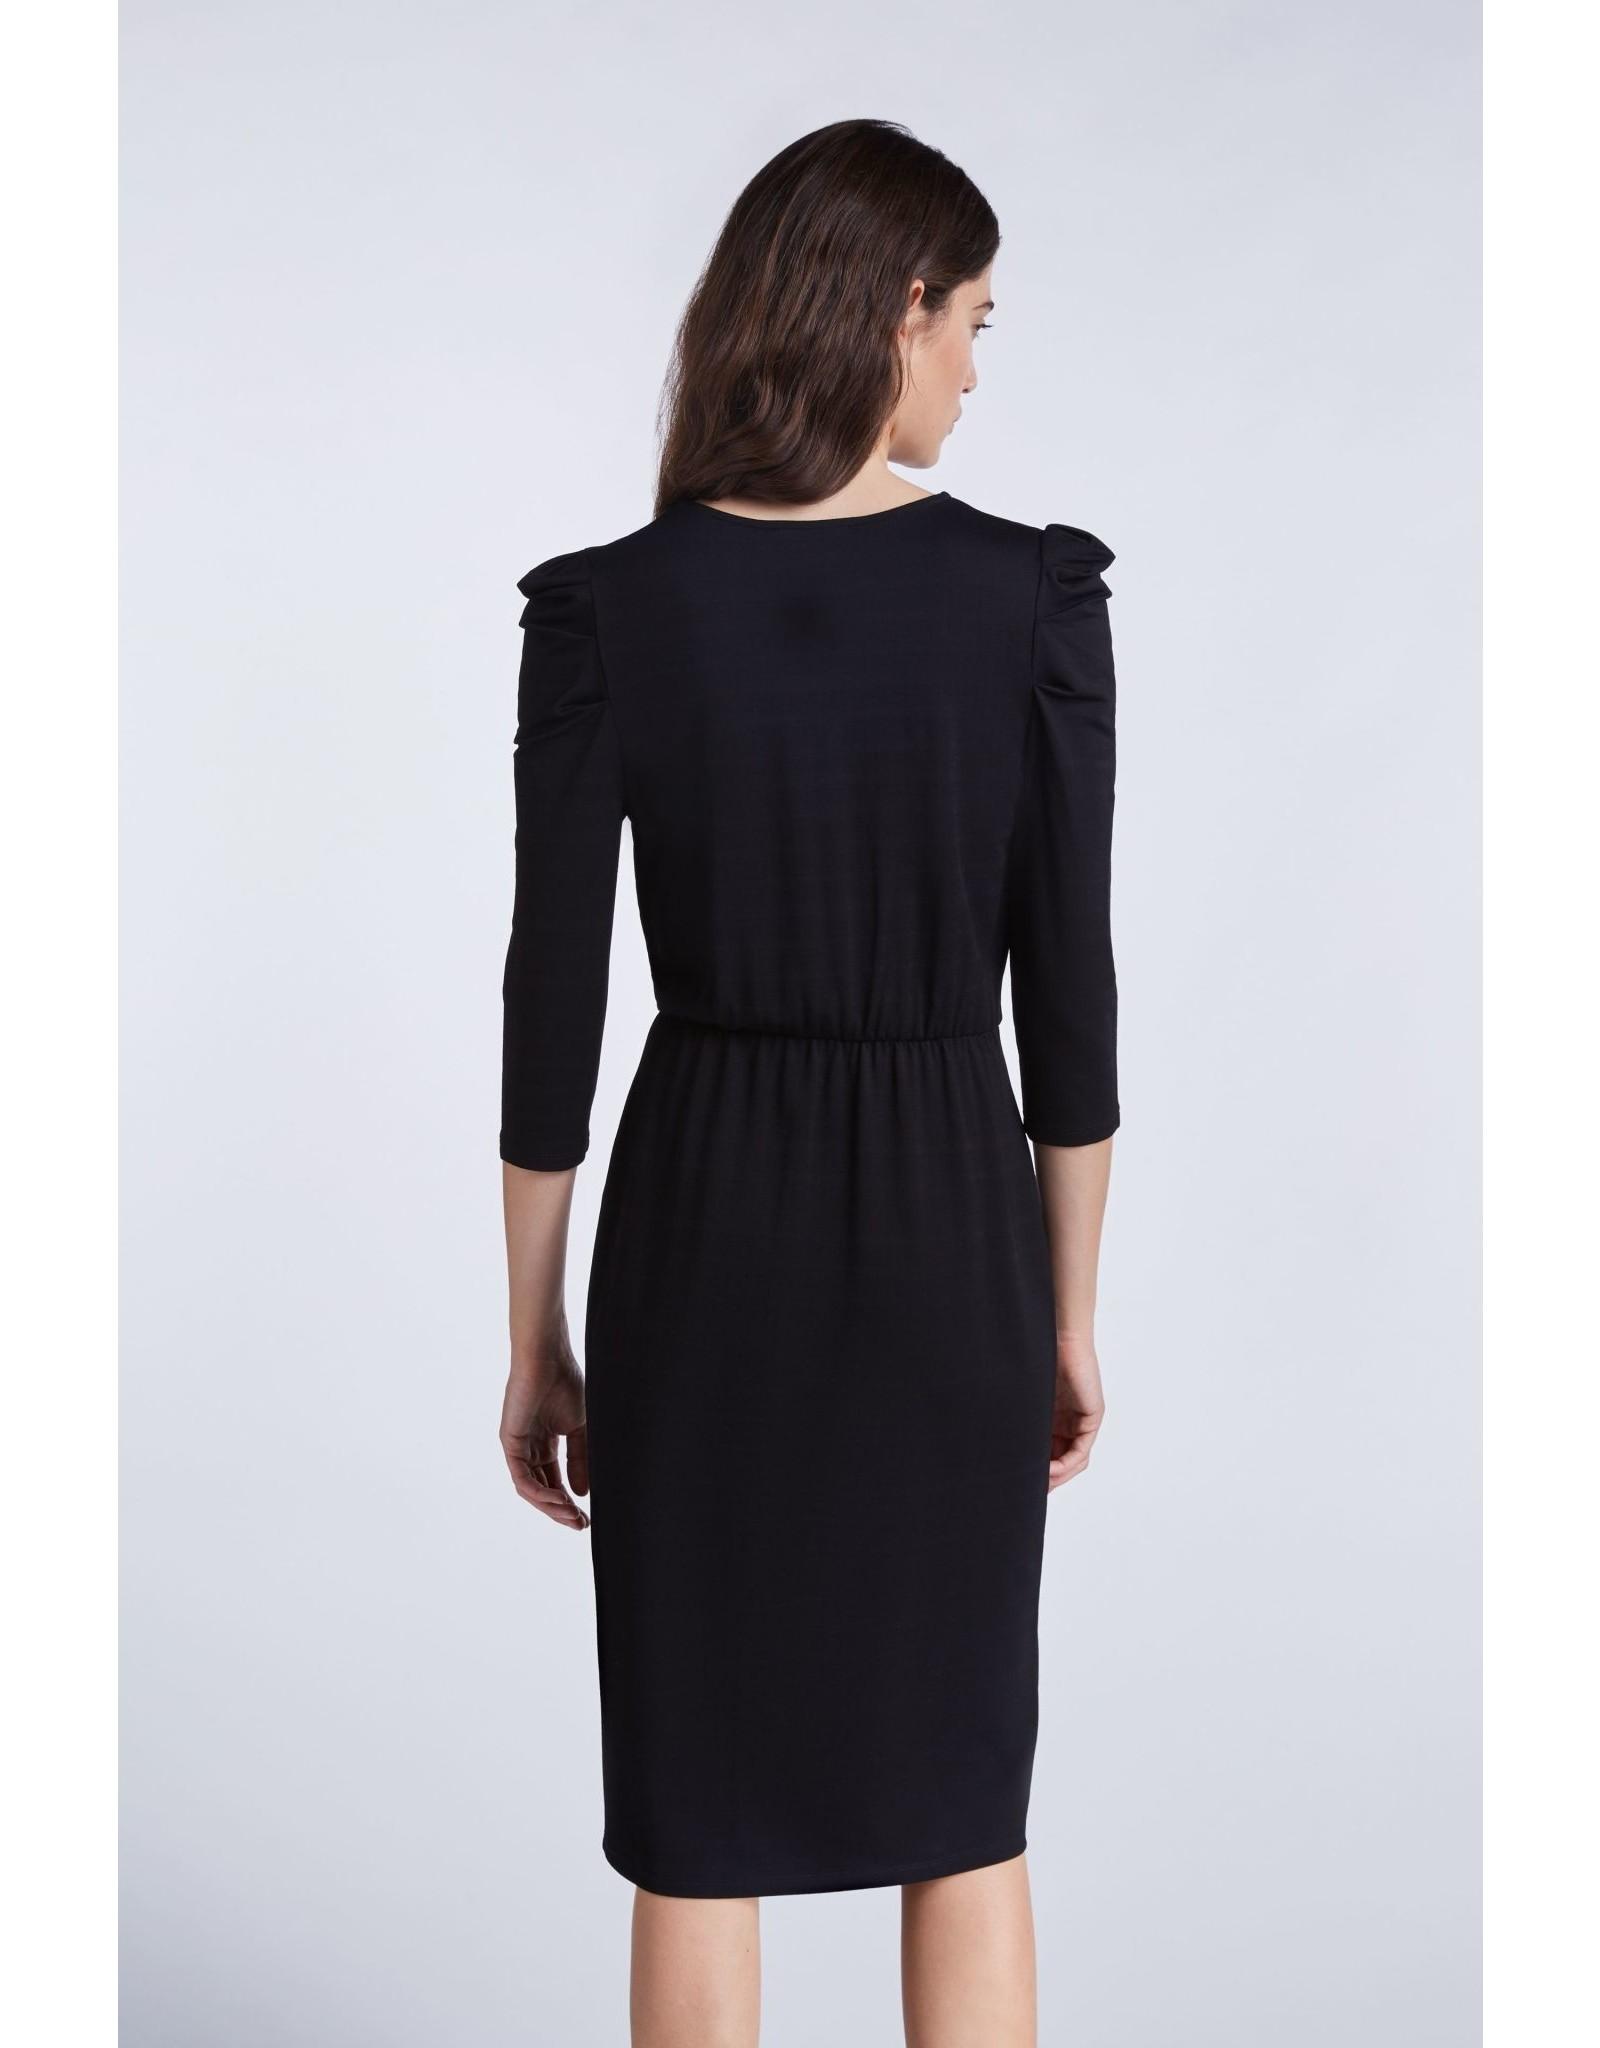 SET High-quality jersey dress black